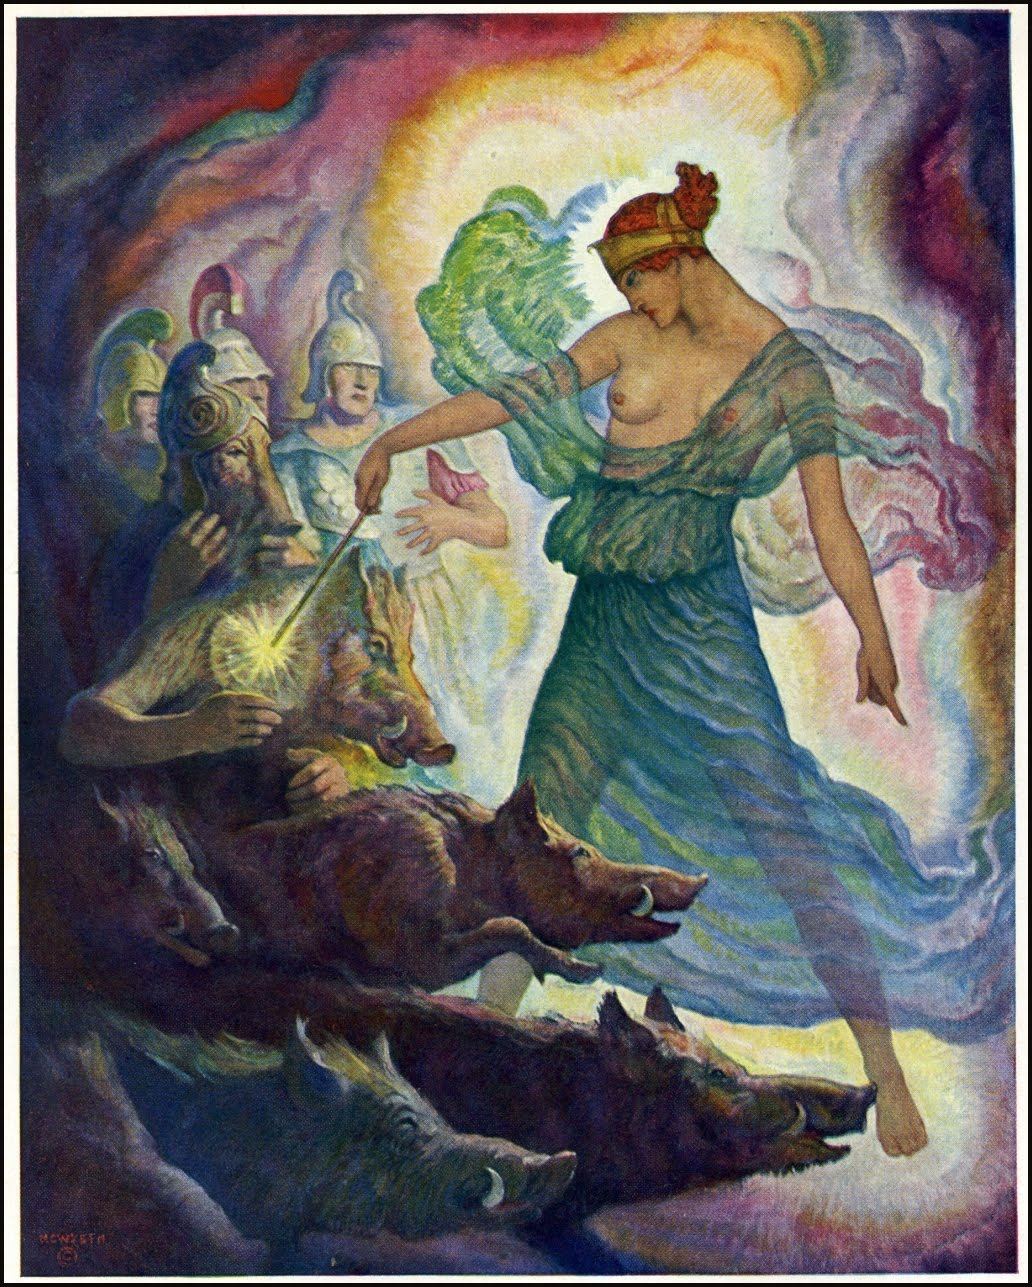 Pellucidar Offerings 3: Odyssey Book | 1032 x 1287 jpeg 262kB